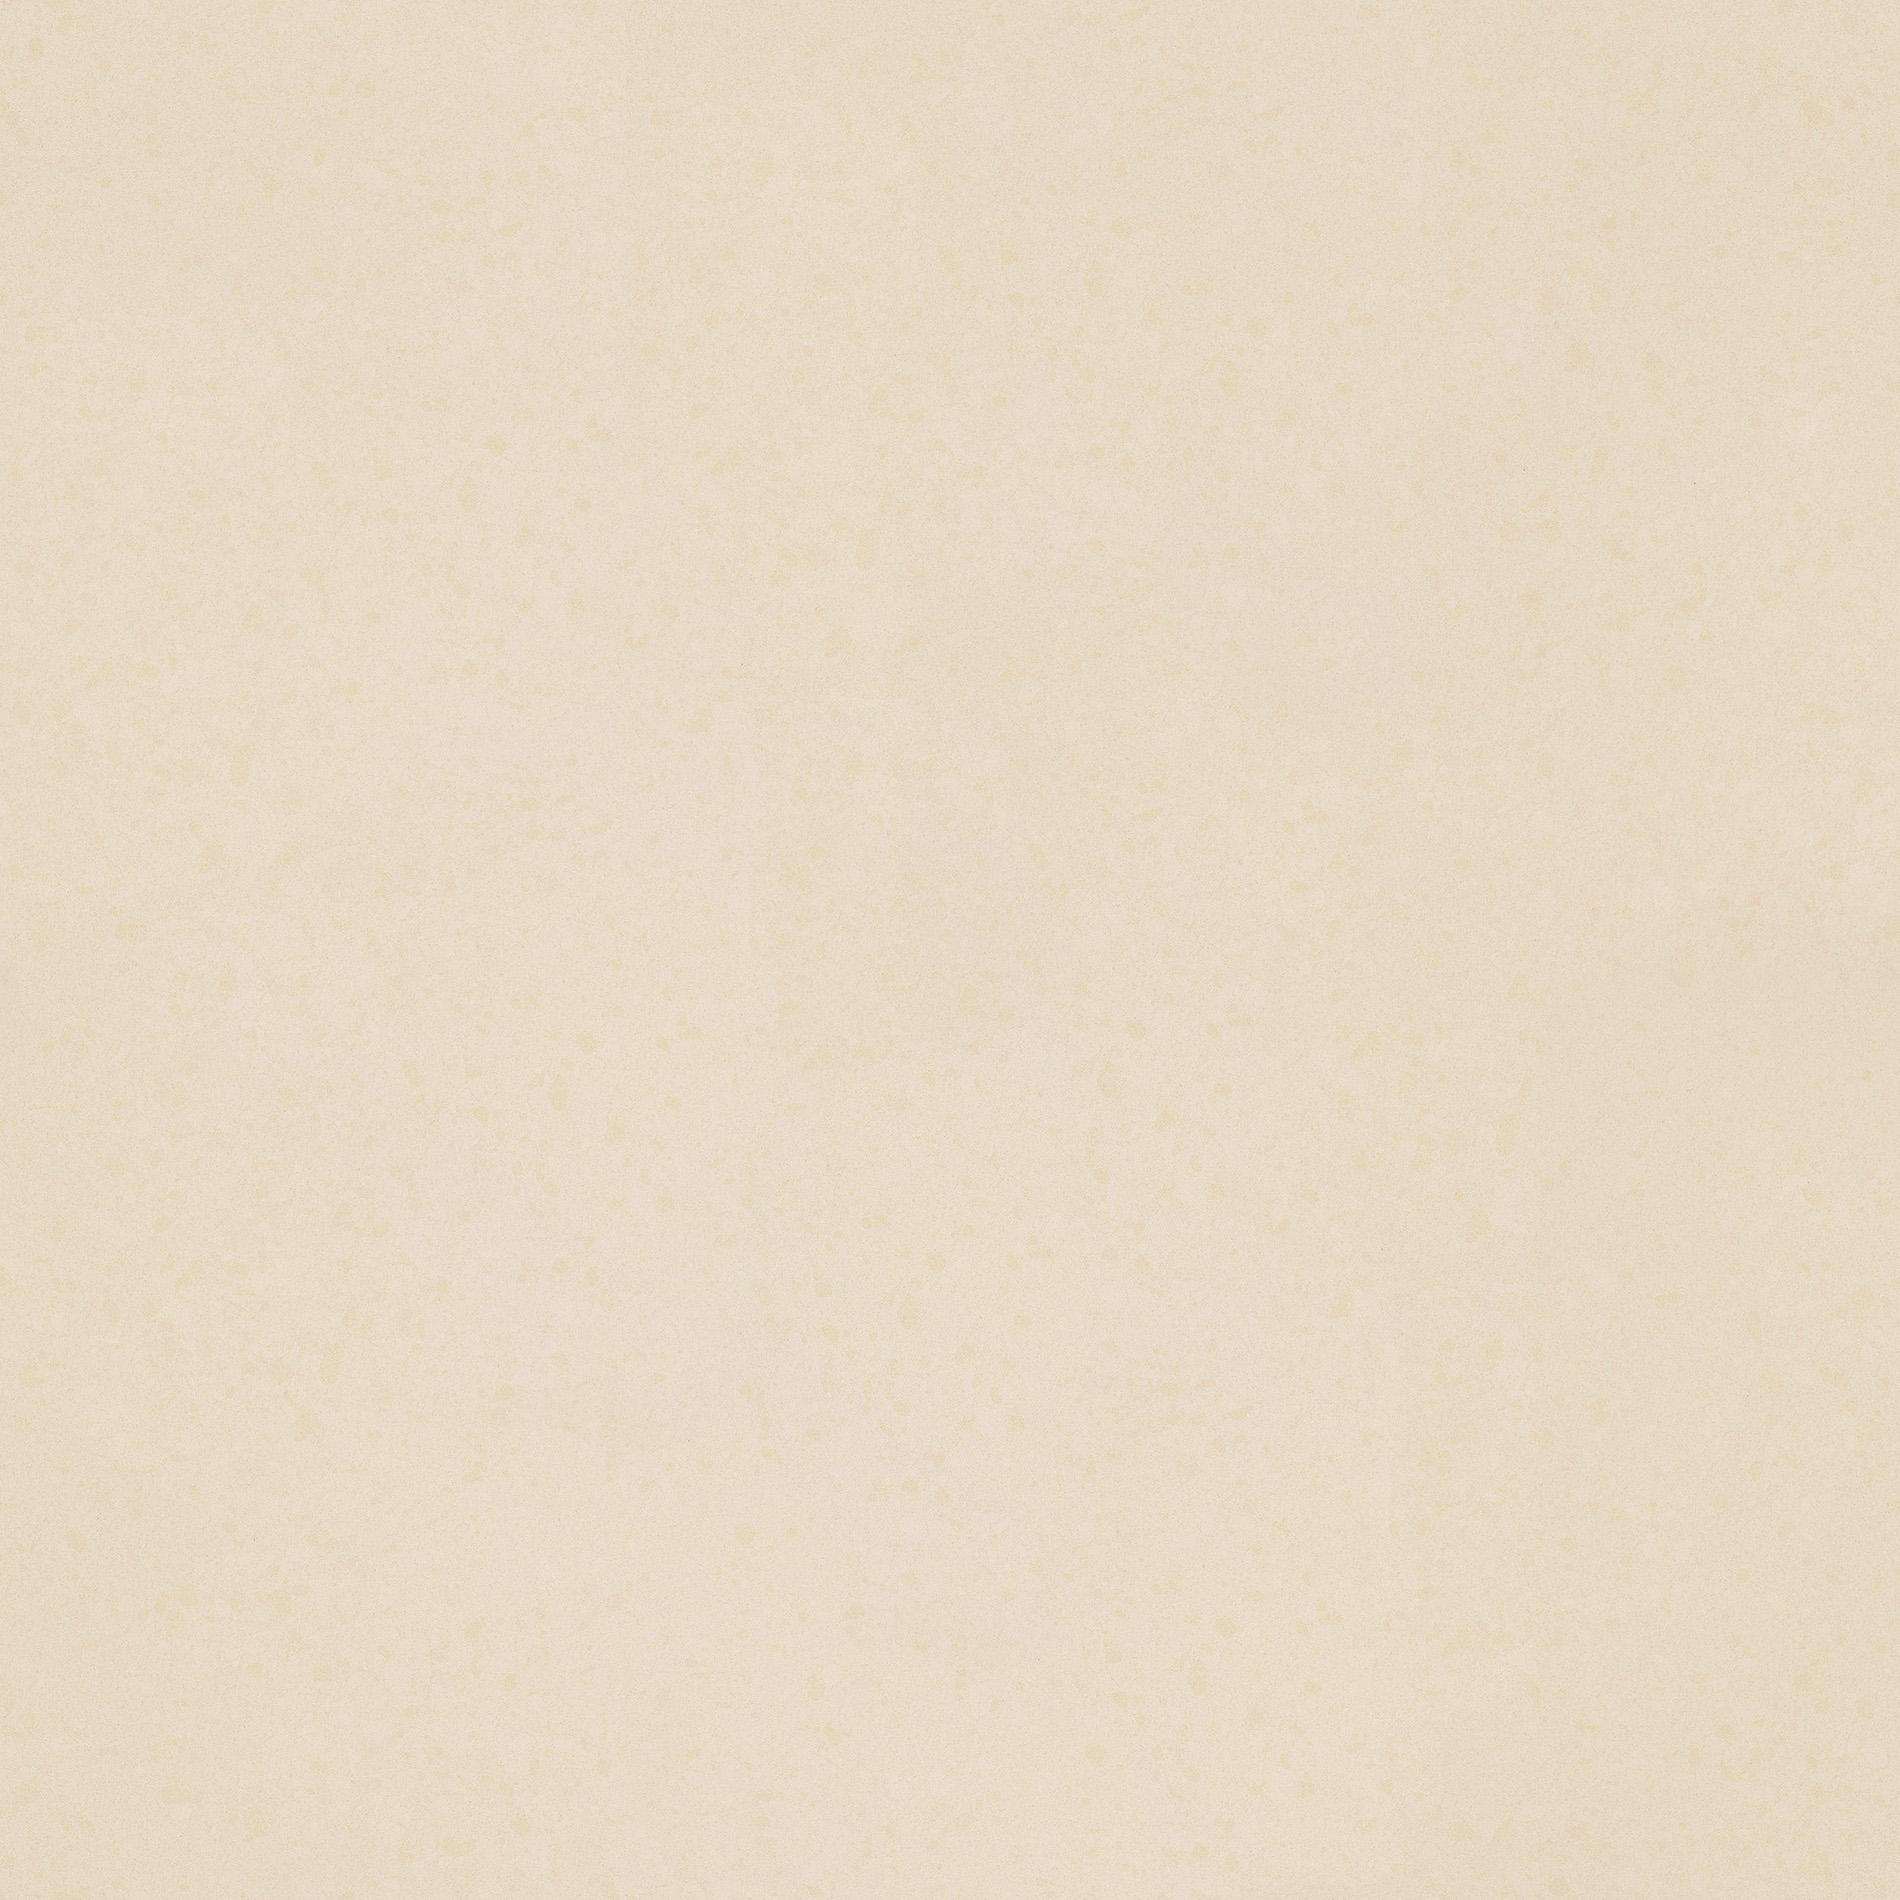 Cuddington-4000x1900_RGB_17V1